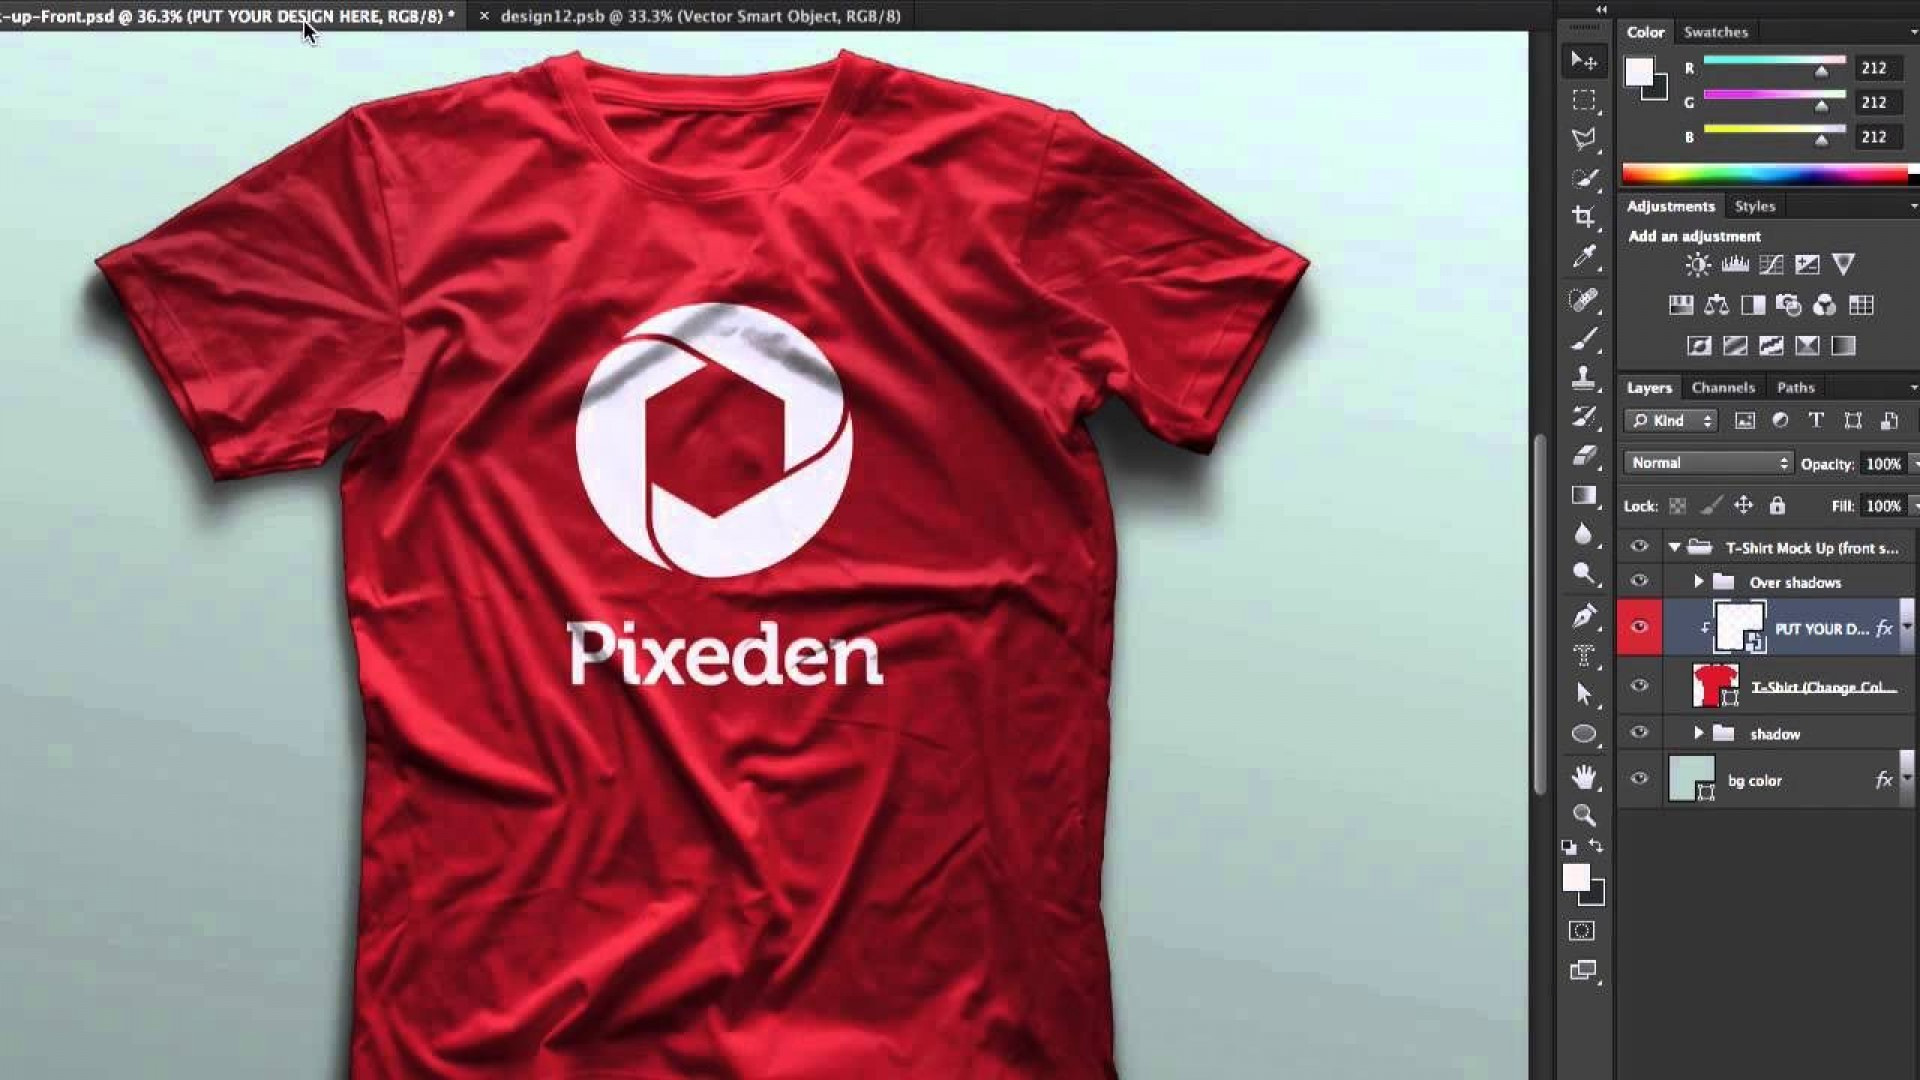 005 Wonderful T Shirt Design Template Psd Inspiration  Blank T-shirt Editable1920